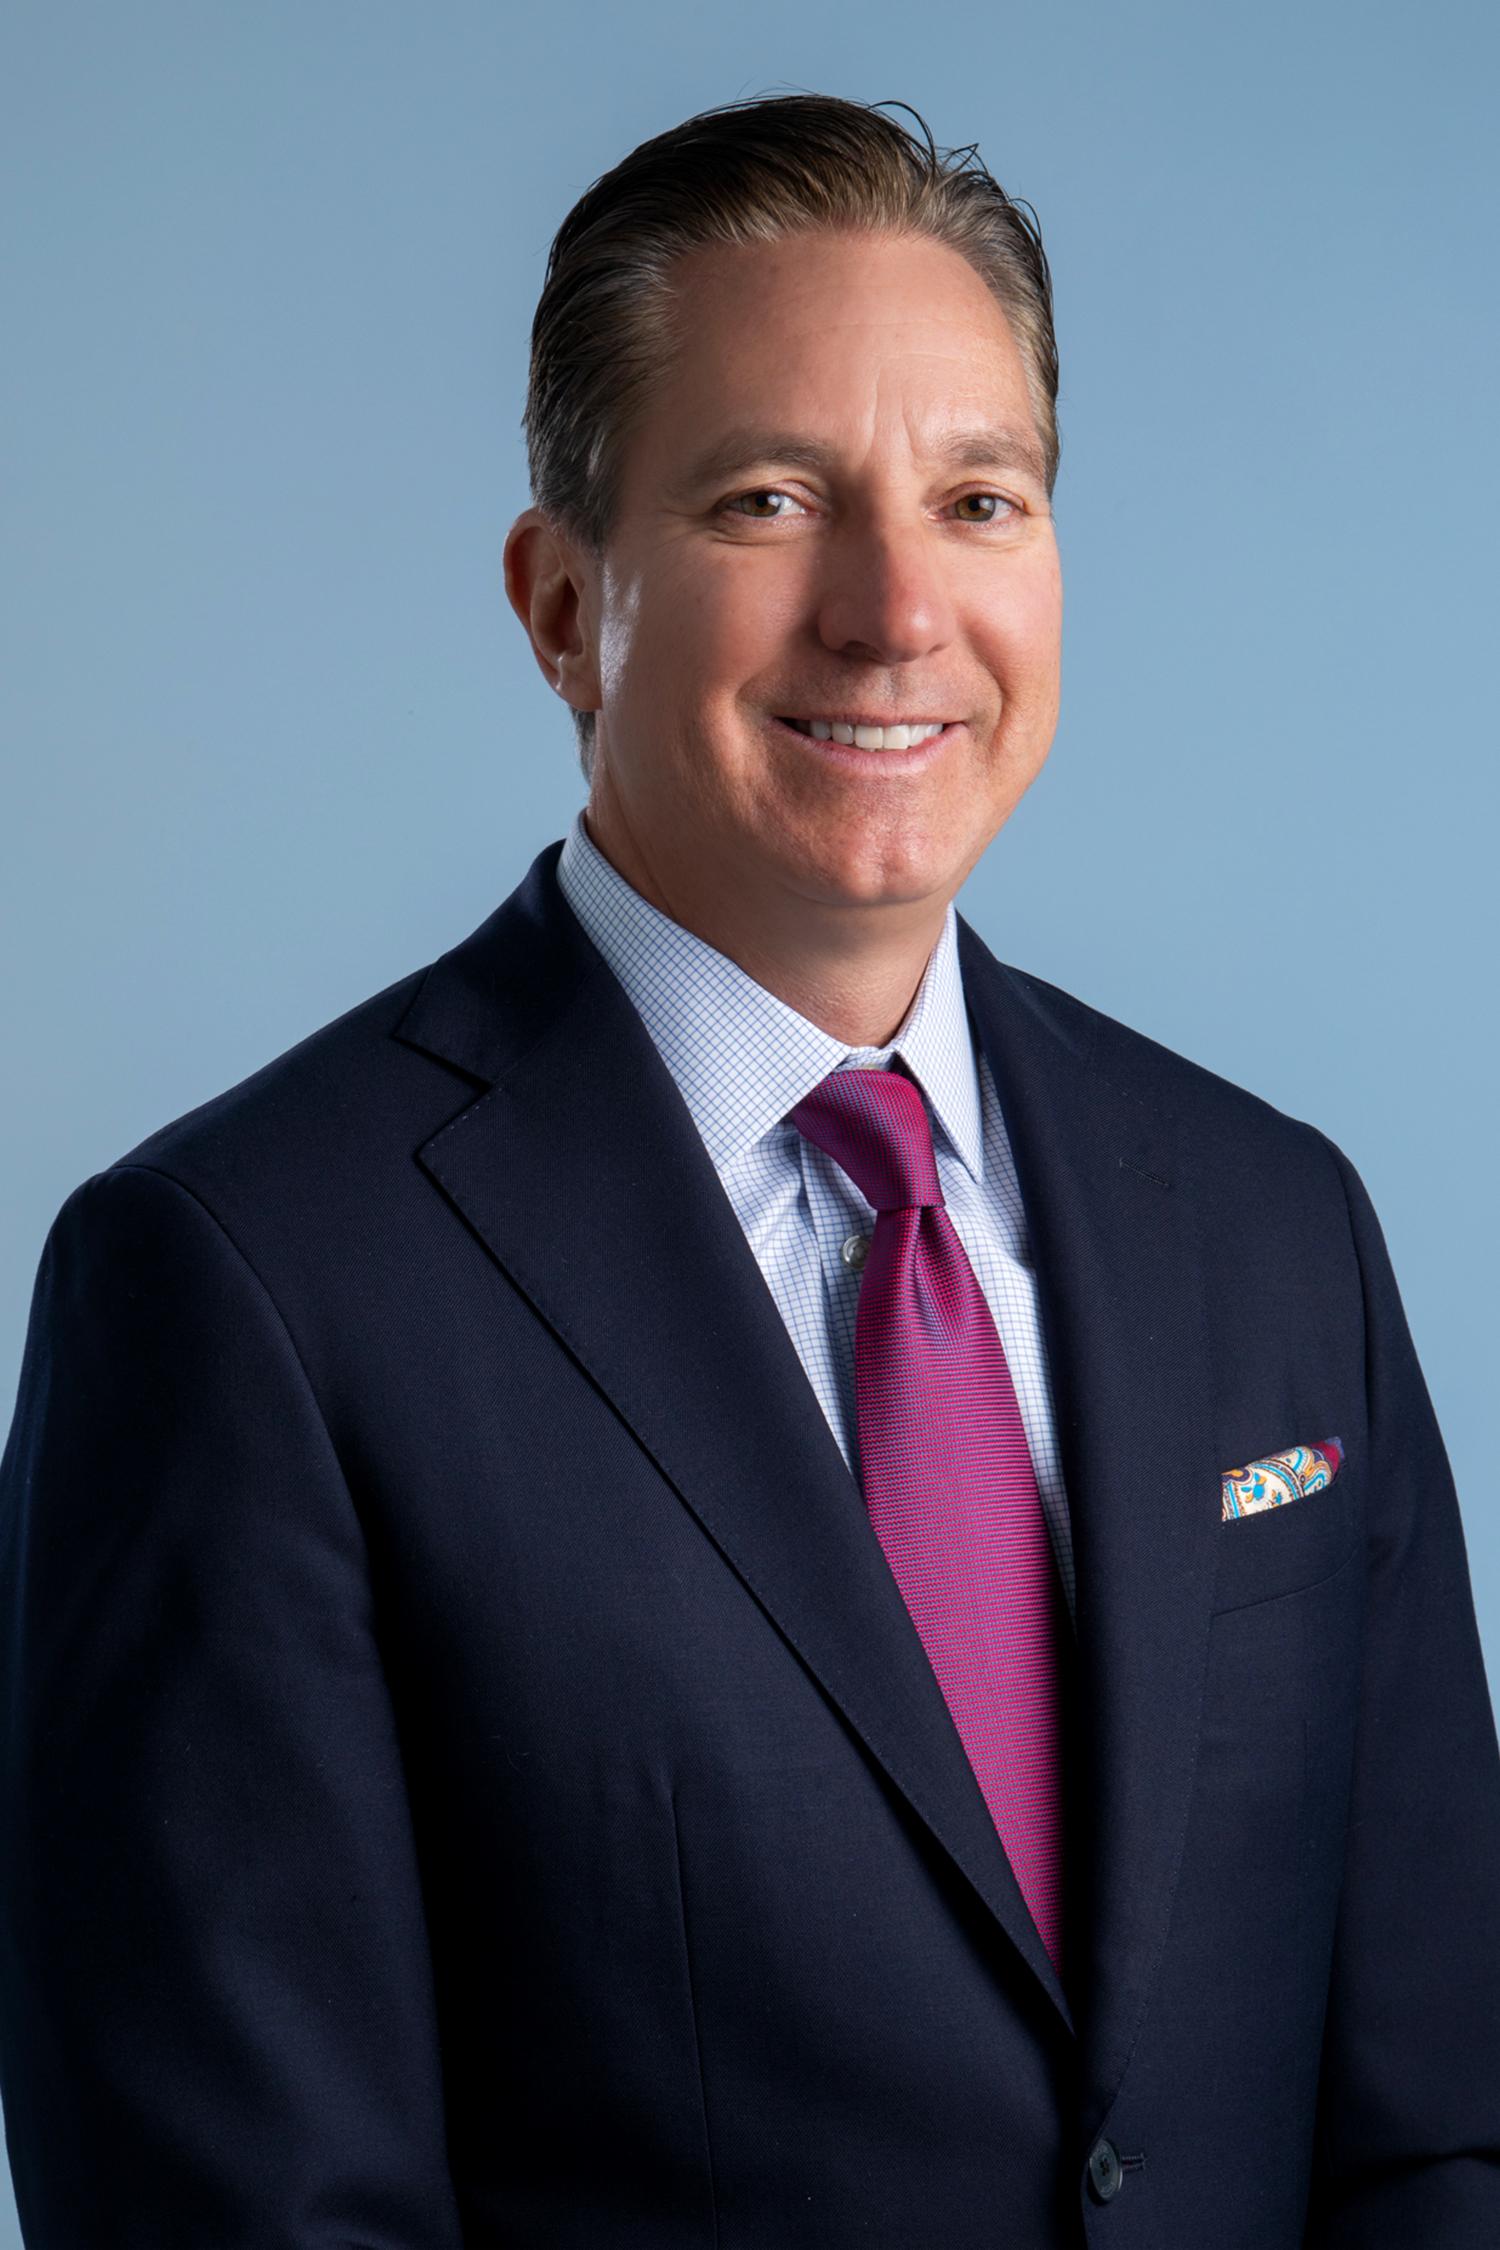 Timothy Drinkall - Board Member